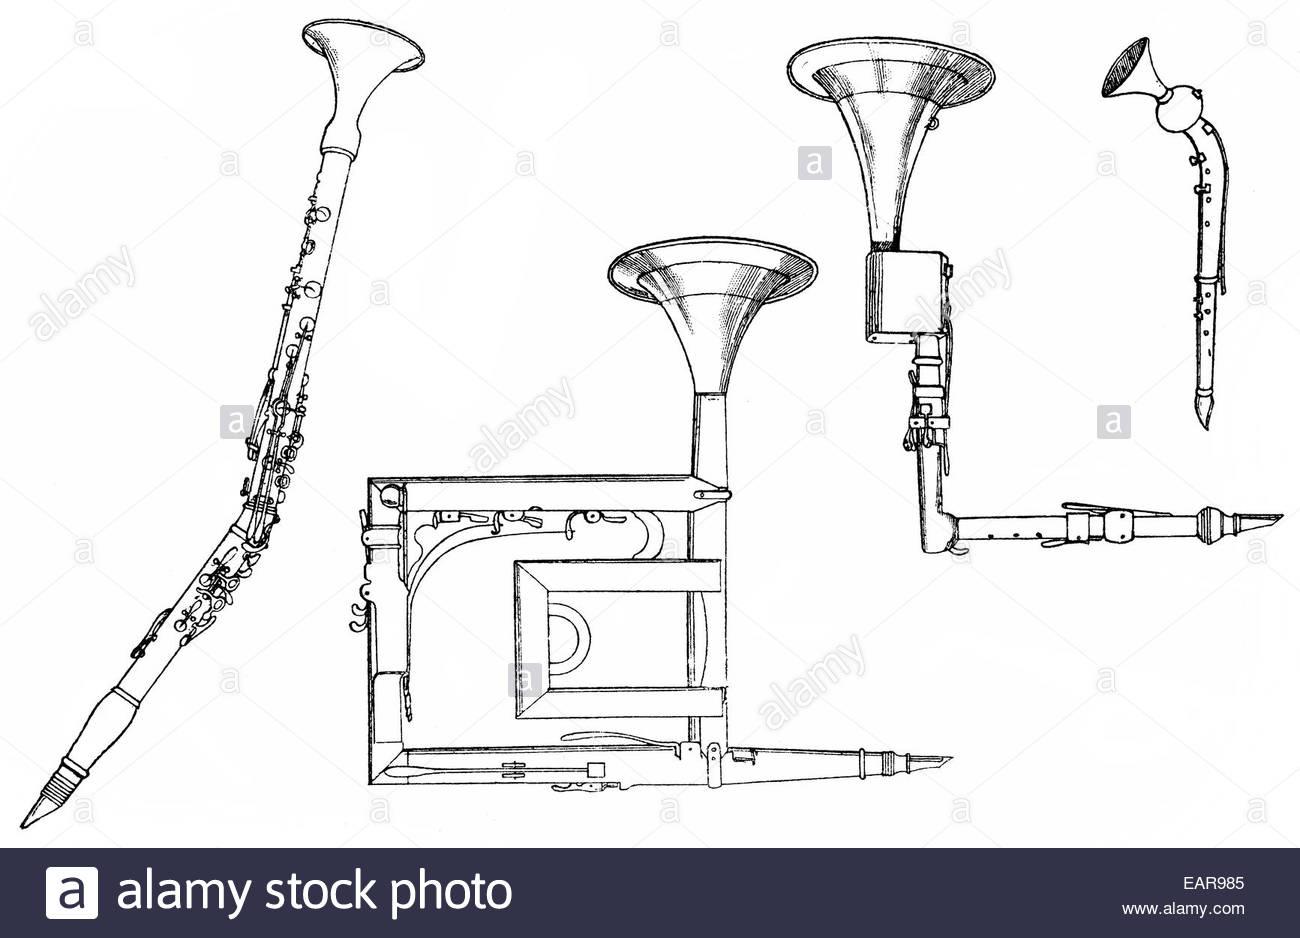 1300x938 Woodwind Instruments, Basset Horn Or Corno Bassetto, Basset